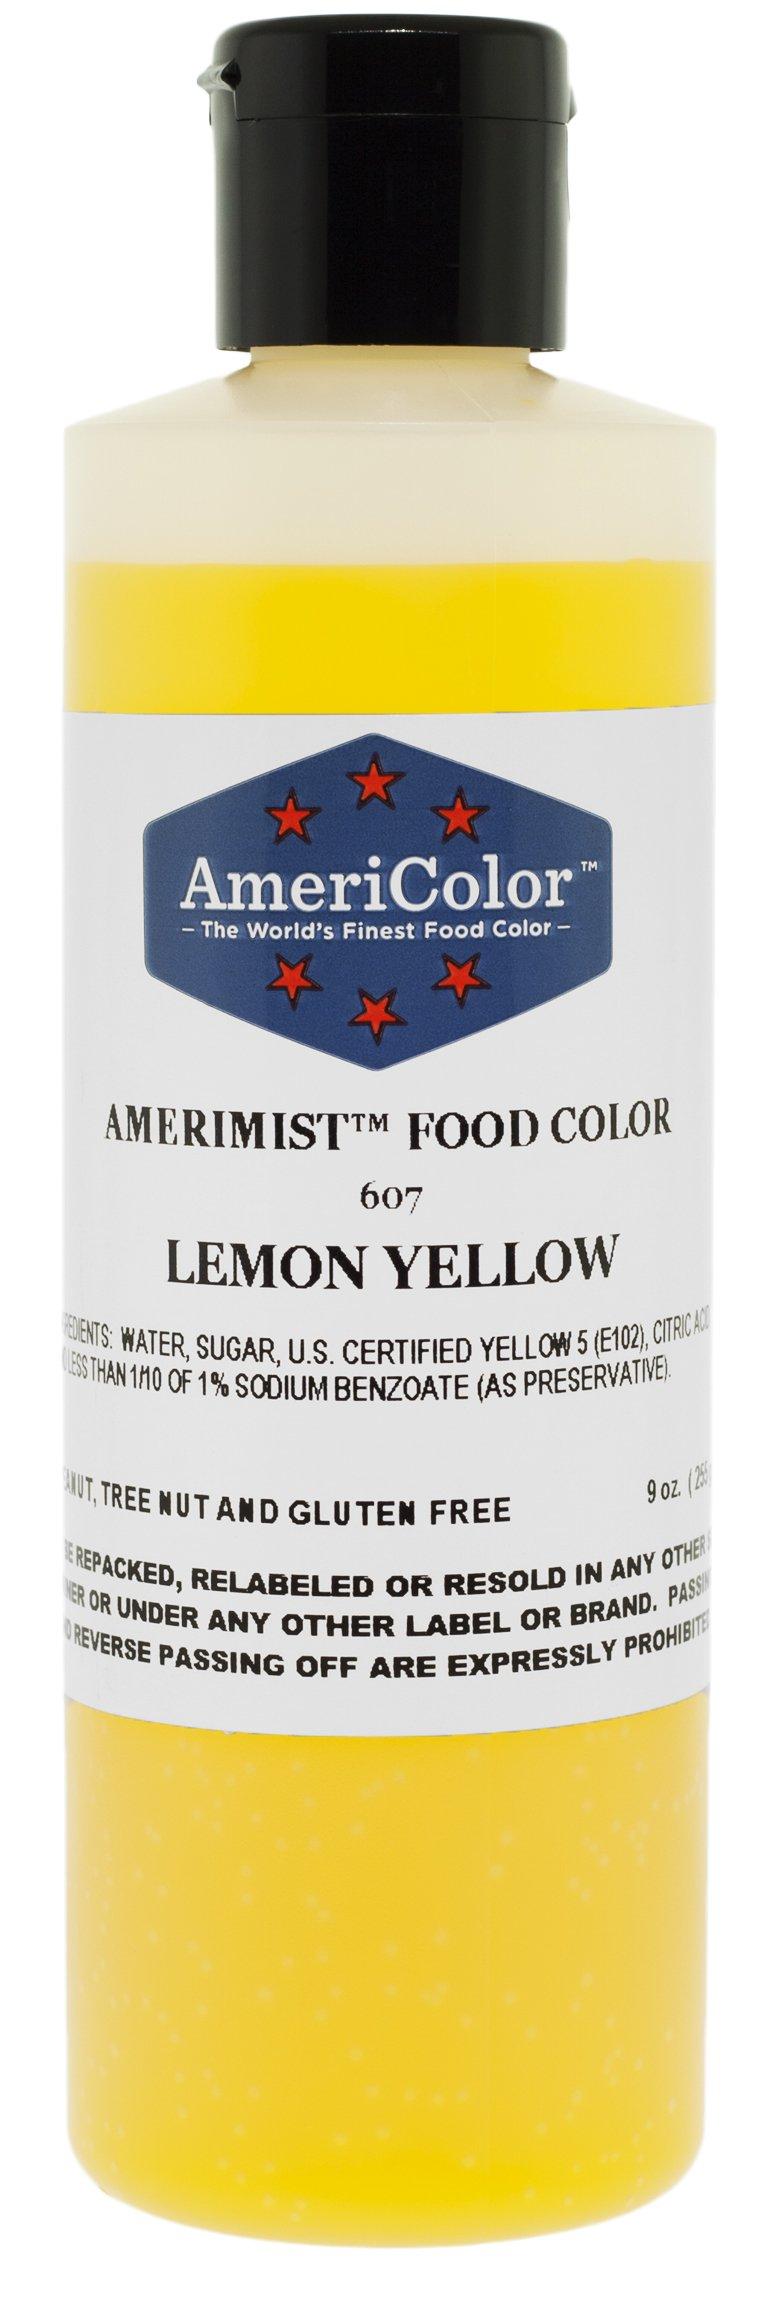 AmeriColor AmeriMist Lemon Yellow Airbrush Food Color, 9 oz